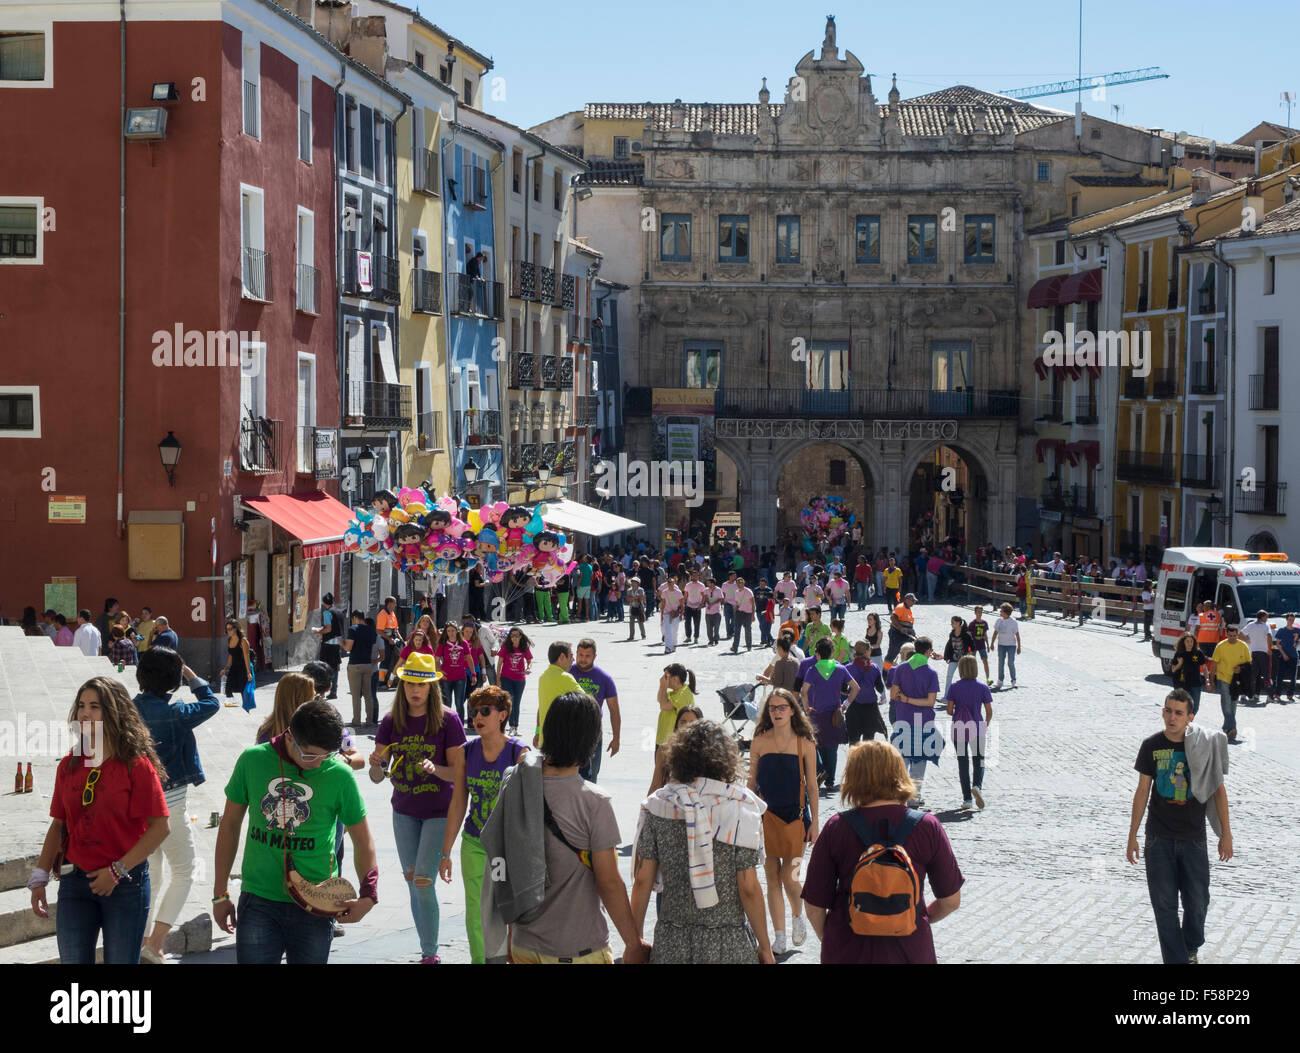 Town of Cuenca in Castilla-La Mancha, Spain, Europe - Stock Image